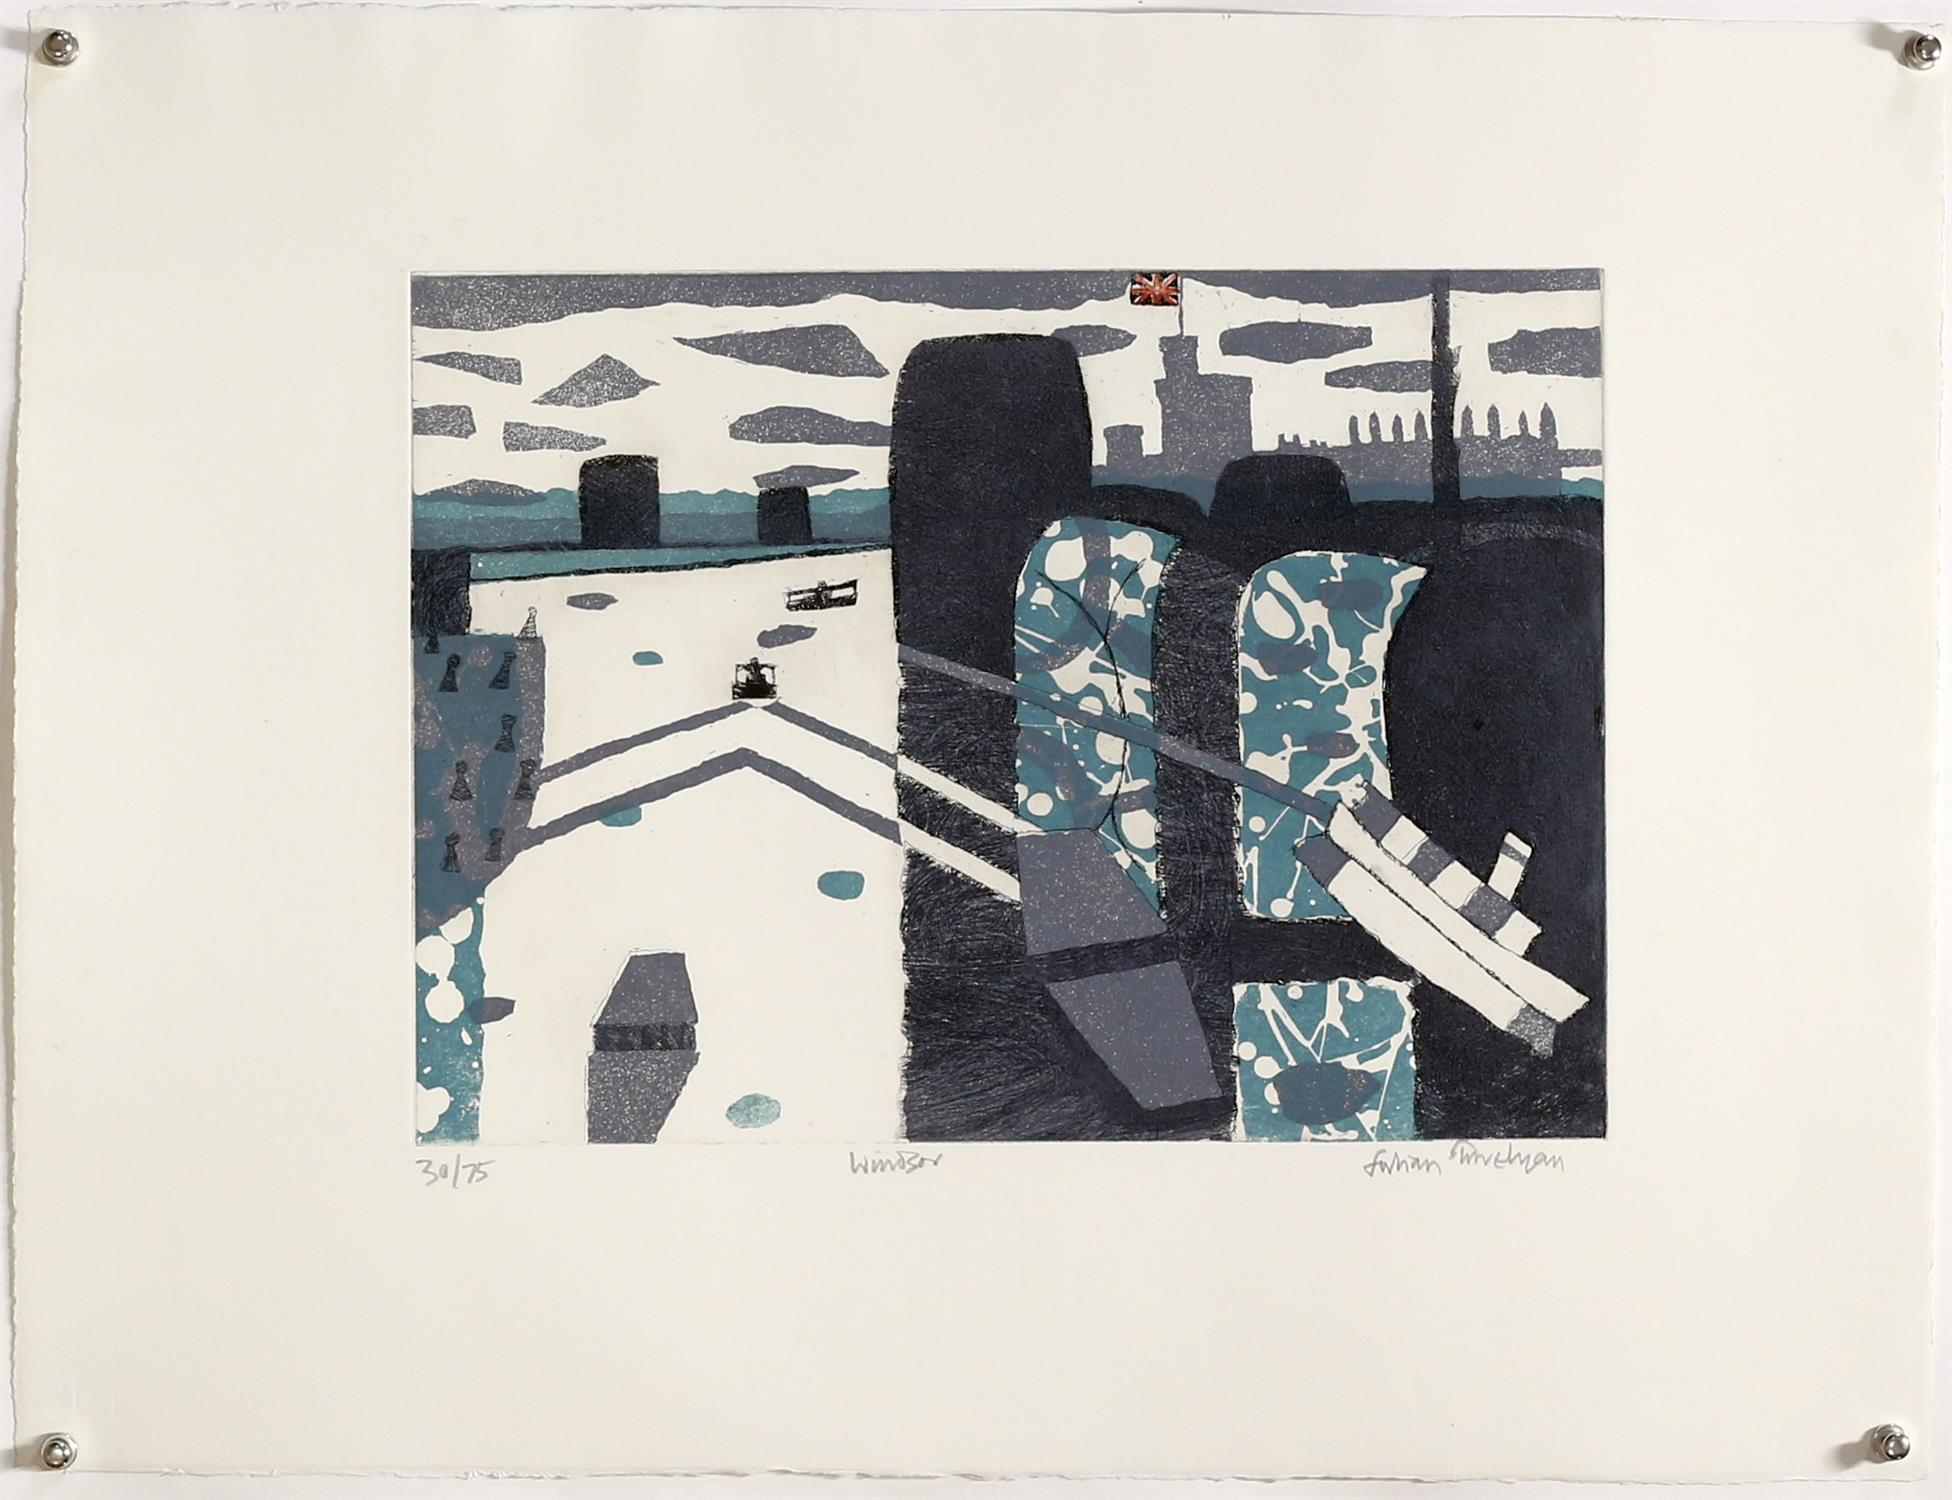 § Julian Trevelyan RA (British, 1910-1988). 'Windsor' (1969). Soft ground etching. - Image 2 of 2